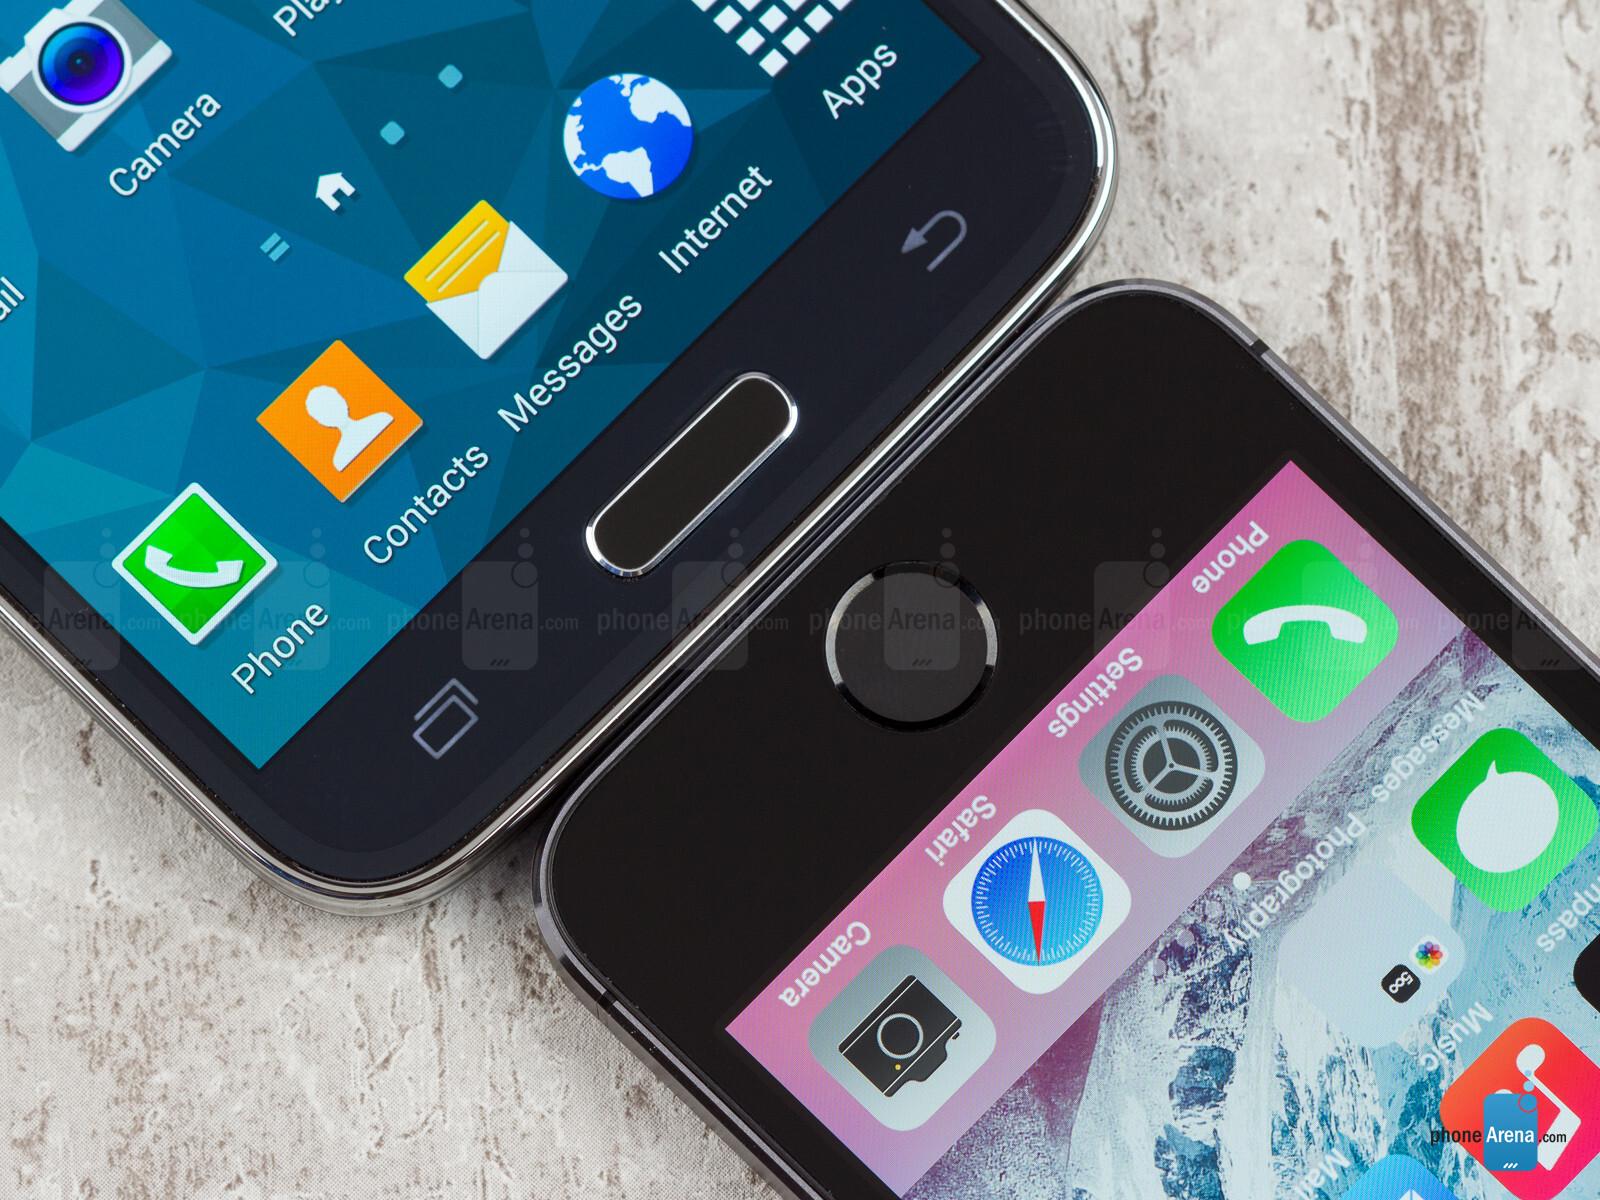 samsung s5 vs iphone 5s phonearena